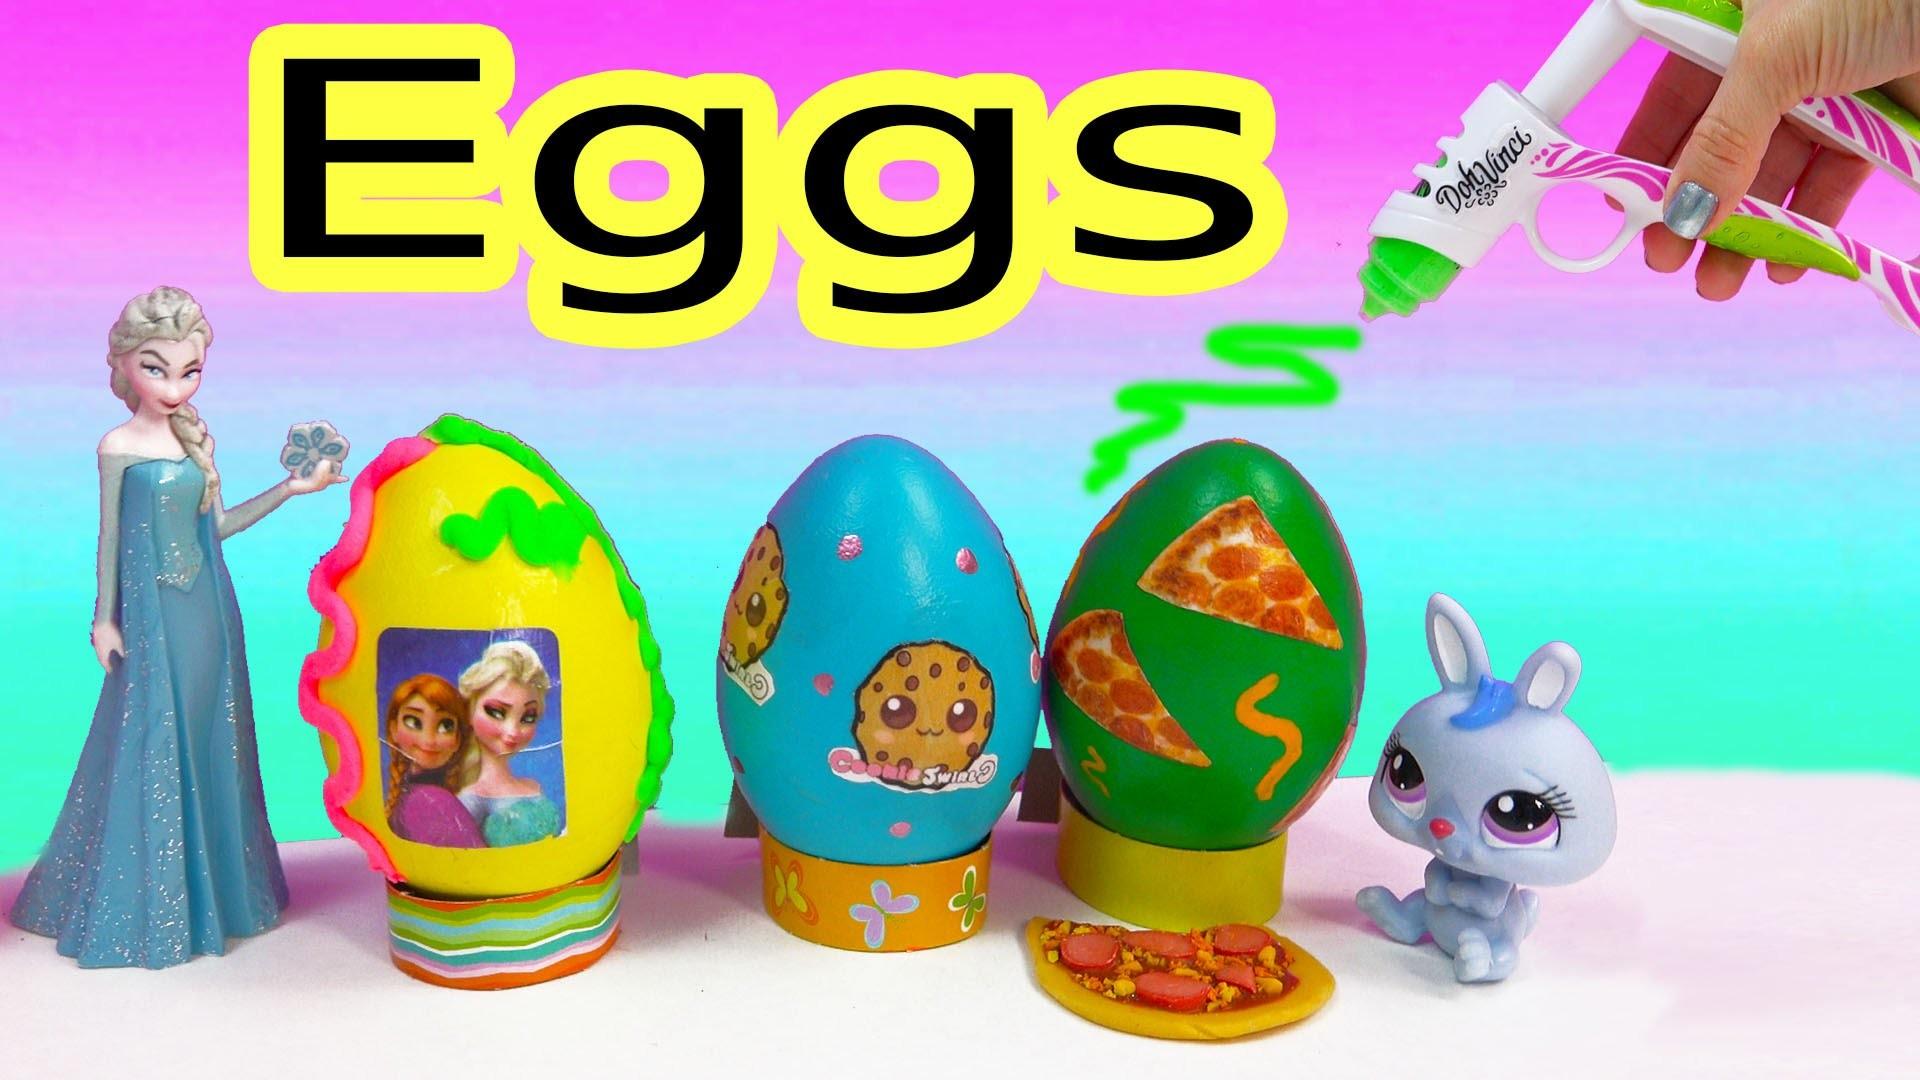 Disney Frozen CookieswirlC Pizza Easter Egg Playdoh Frosting DohVinci DIY Play Doh Vinci Fun 2 Craft